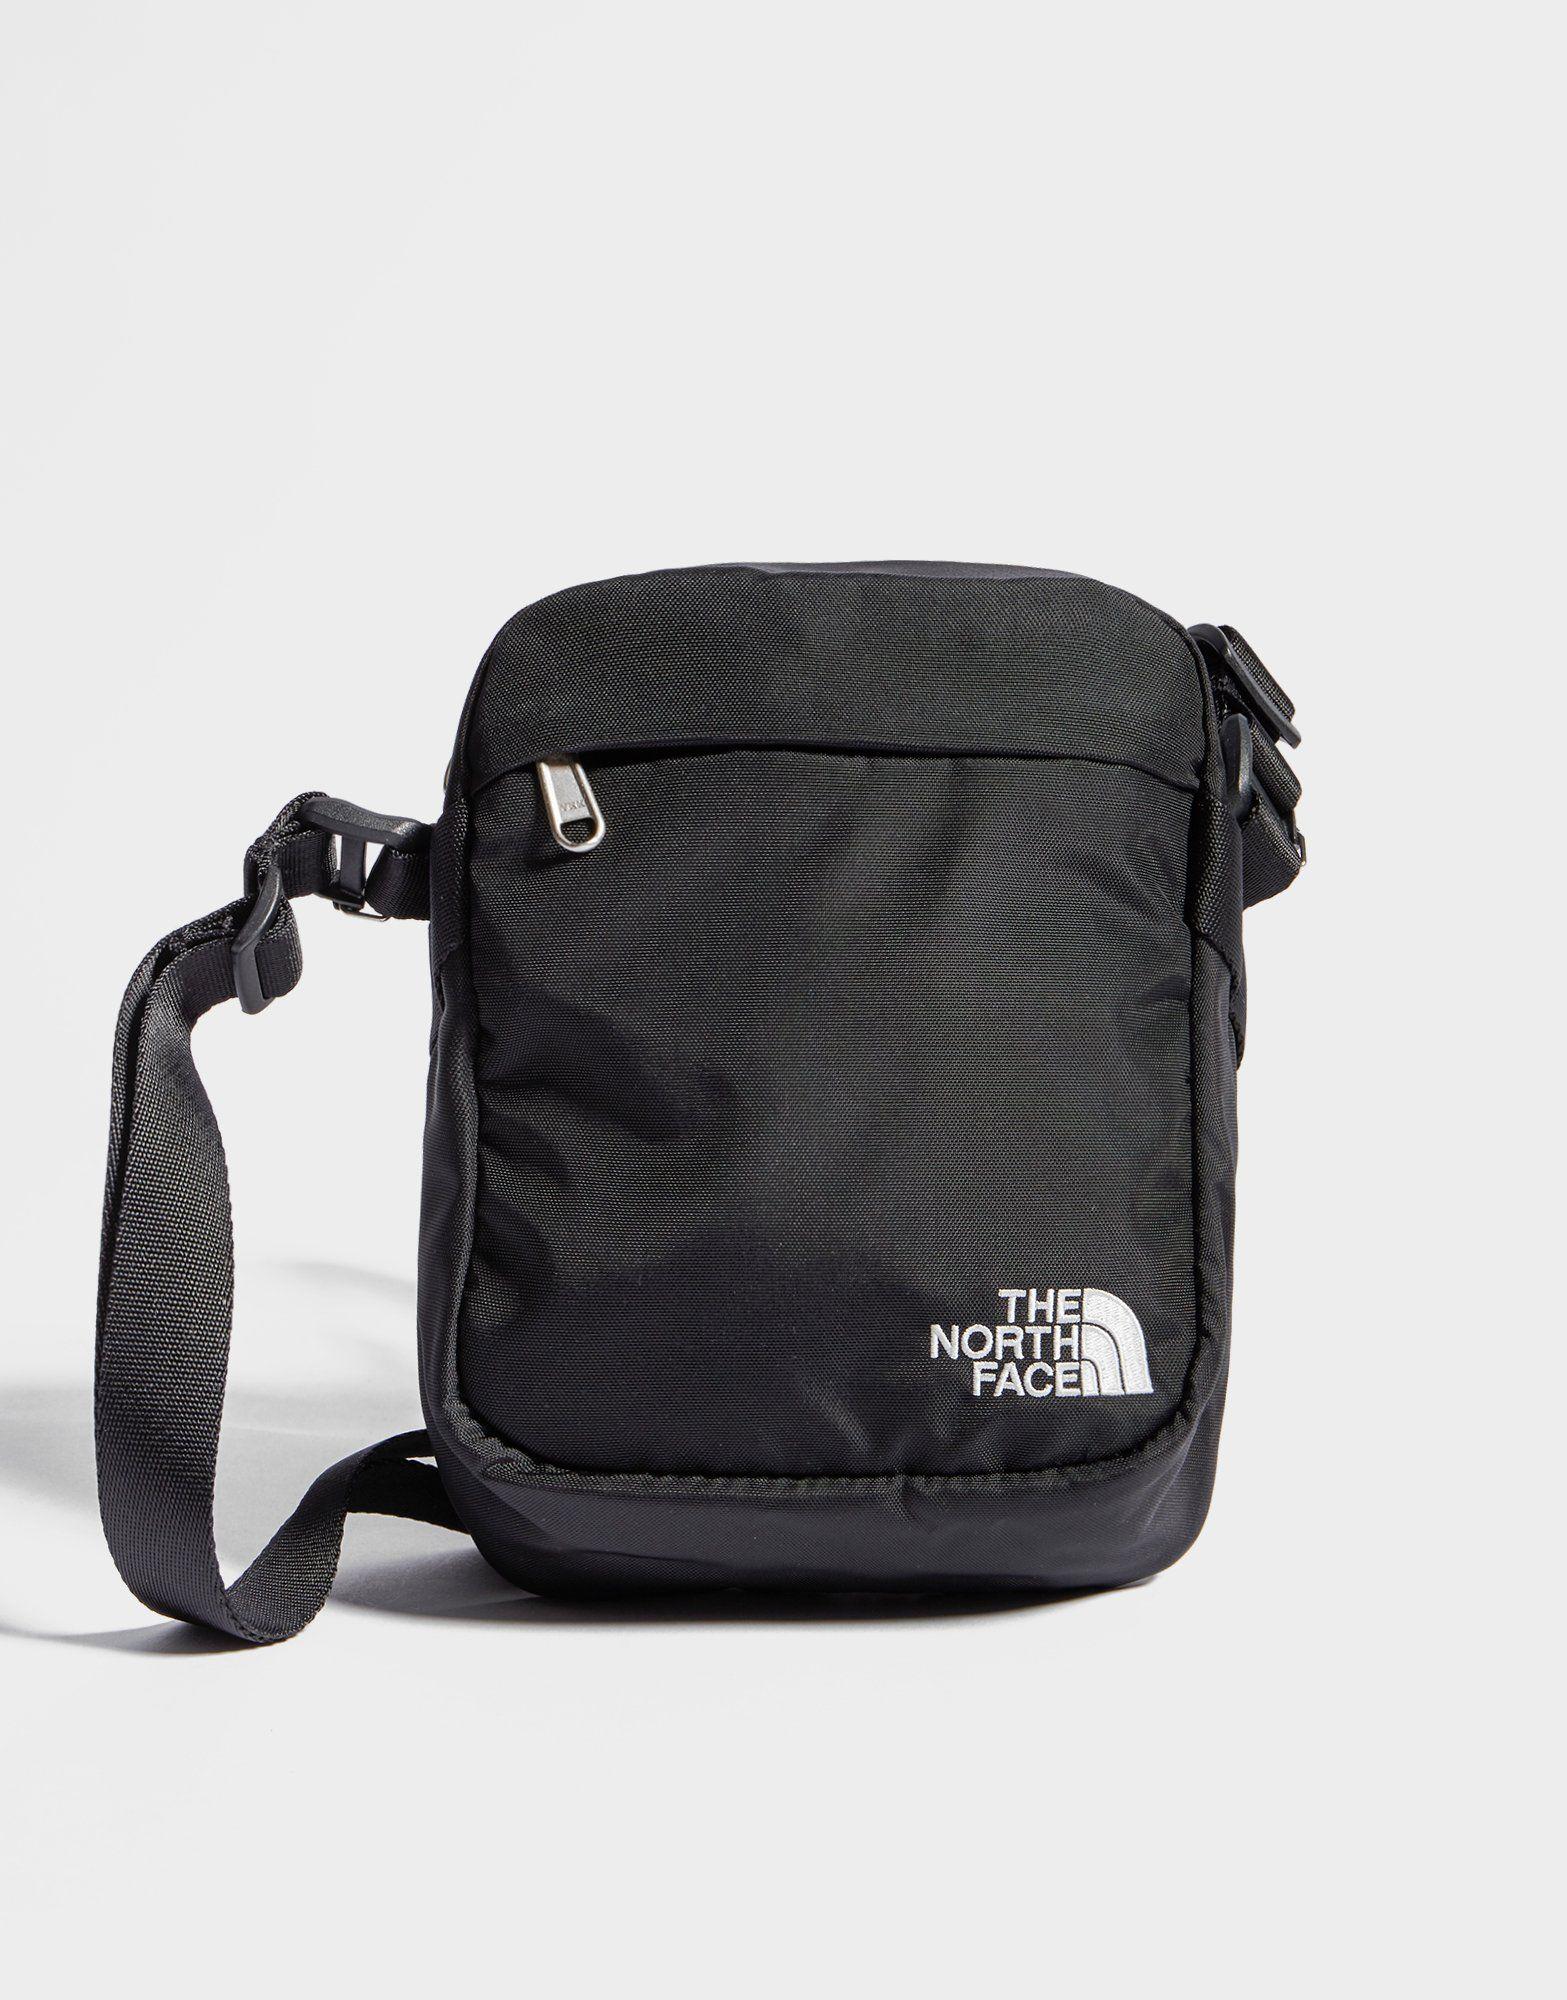 The North Face Convertible Crossbody Bag